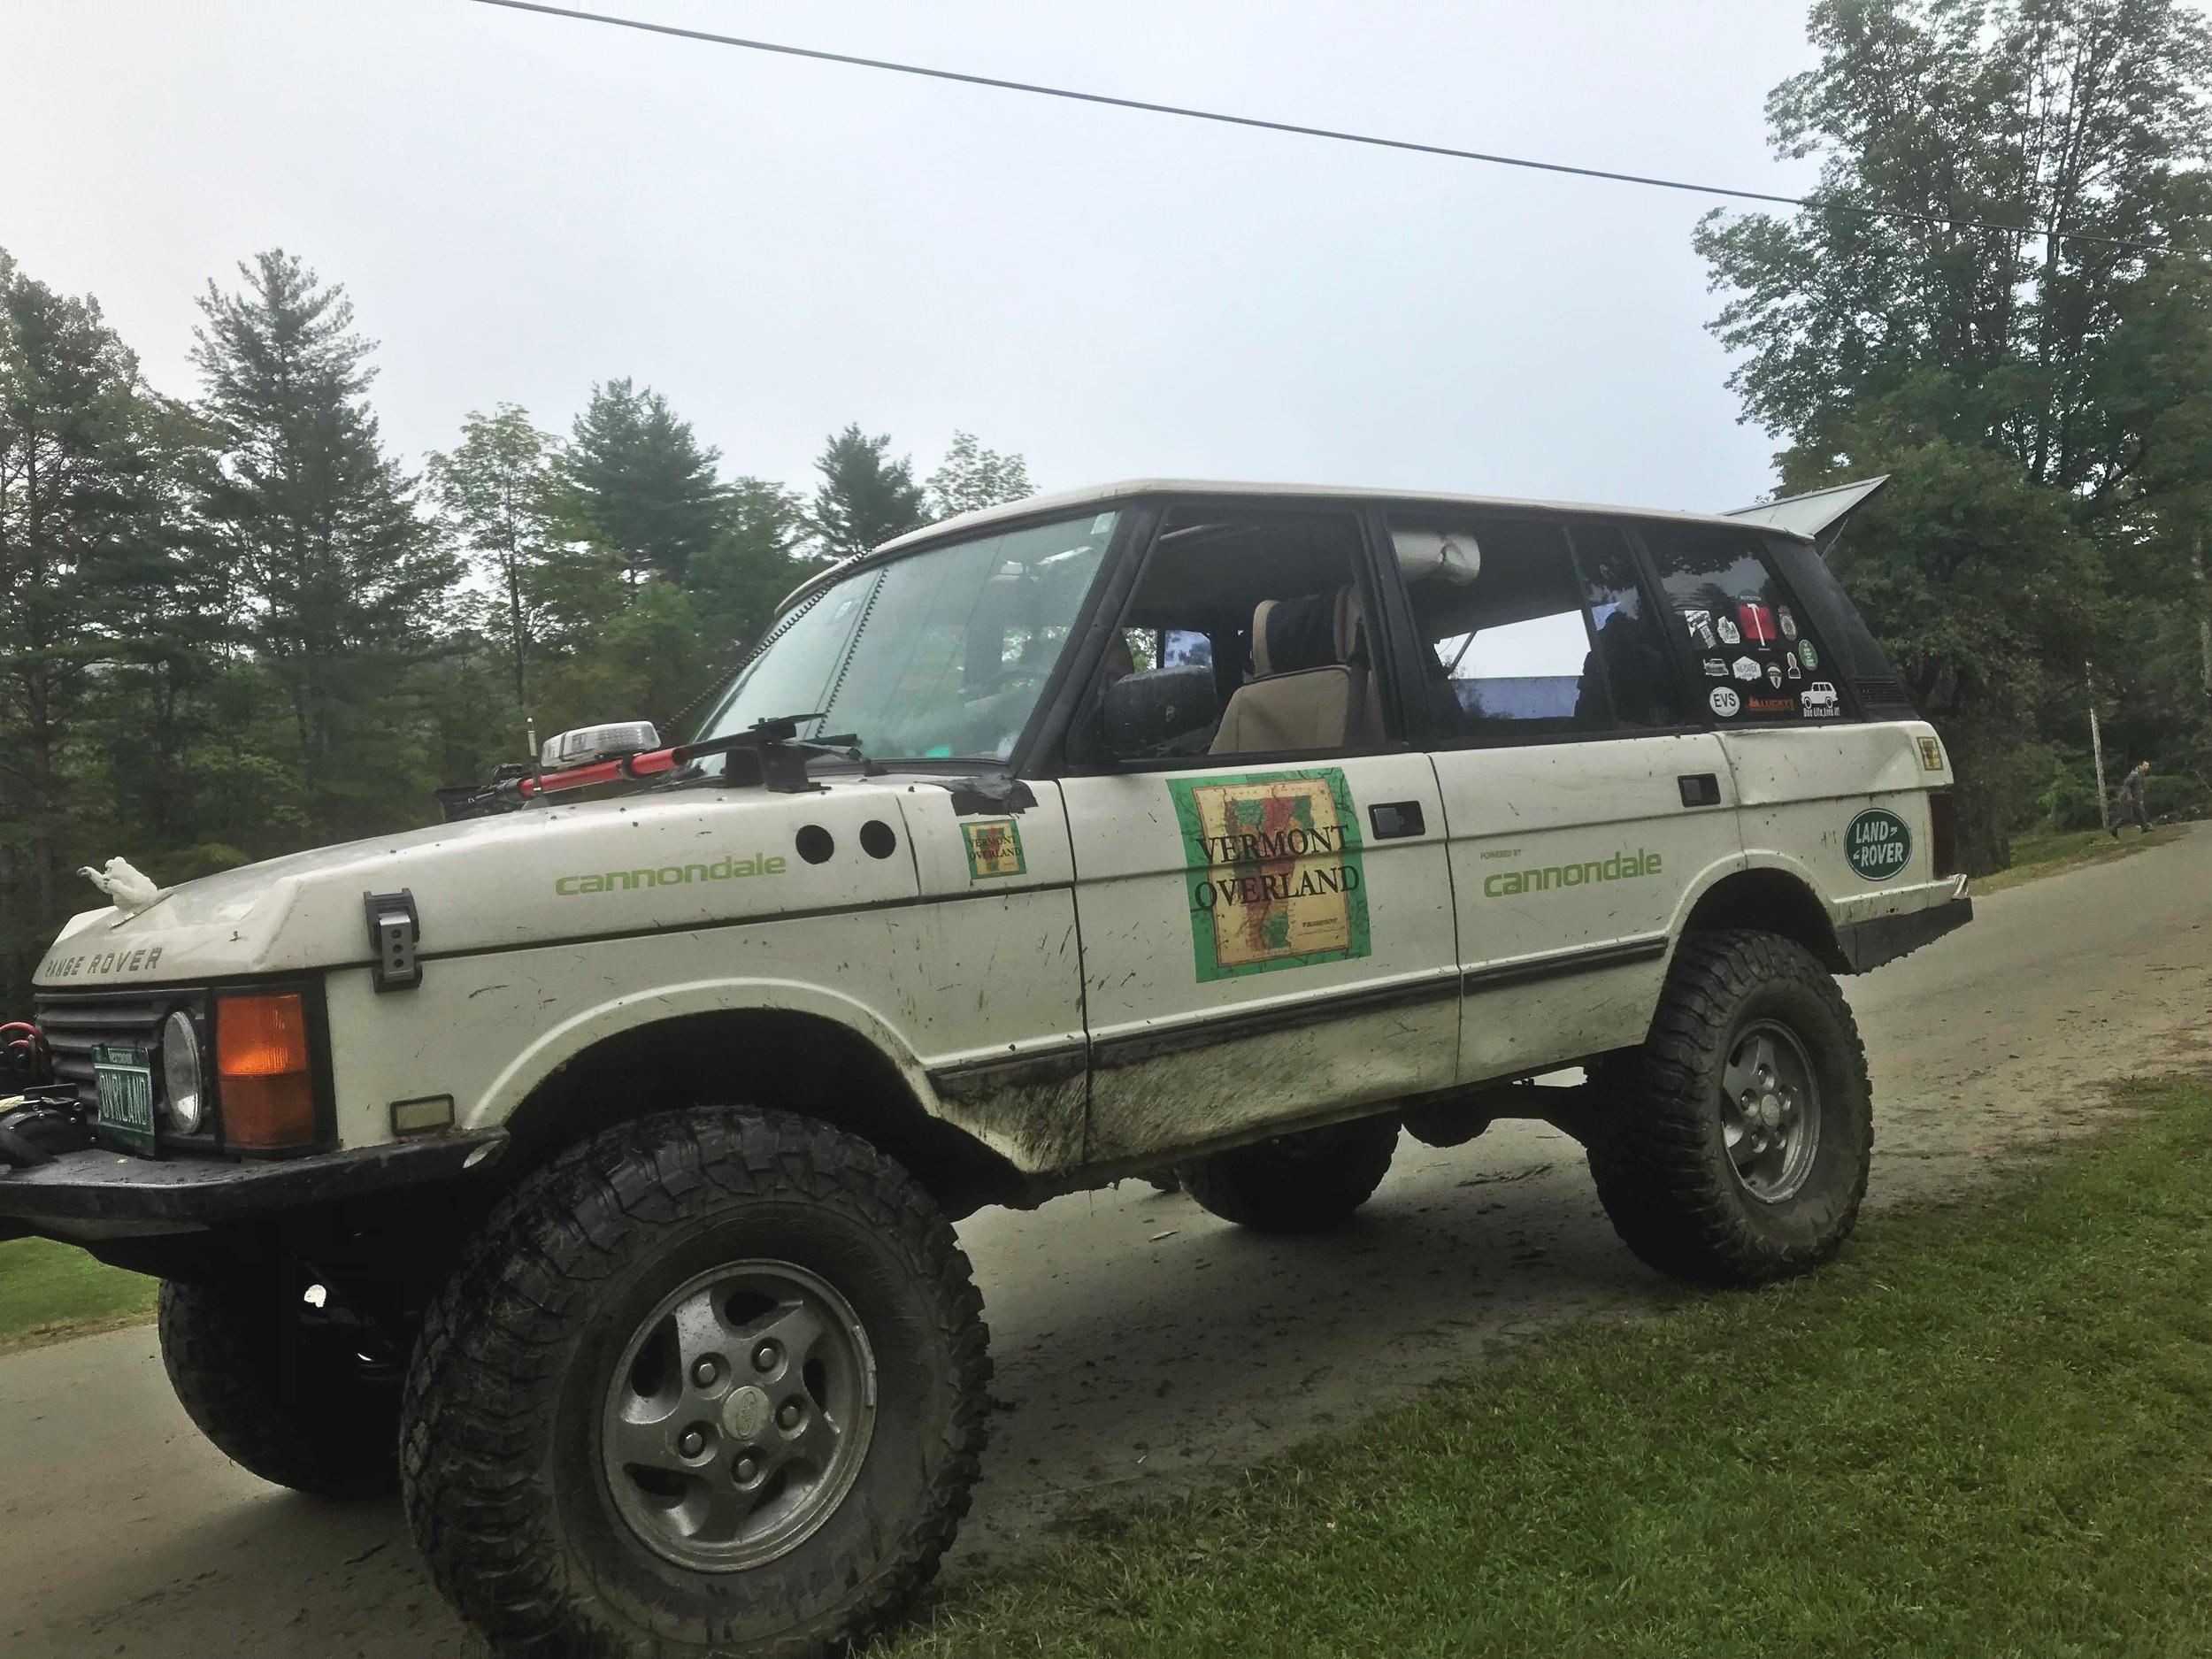 Vermont Overland